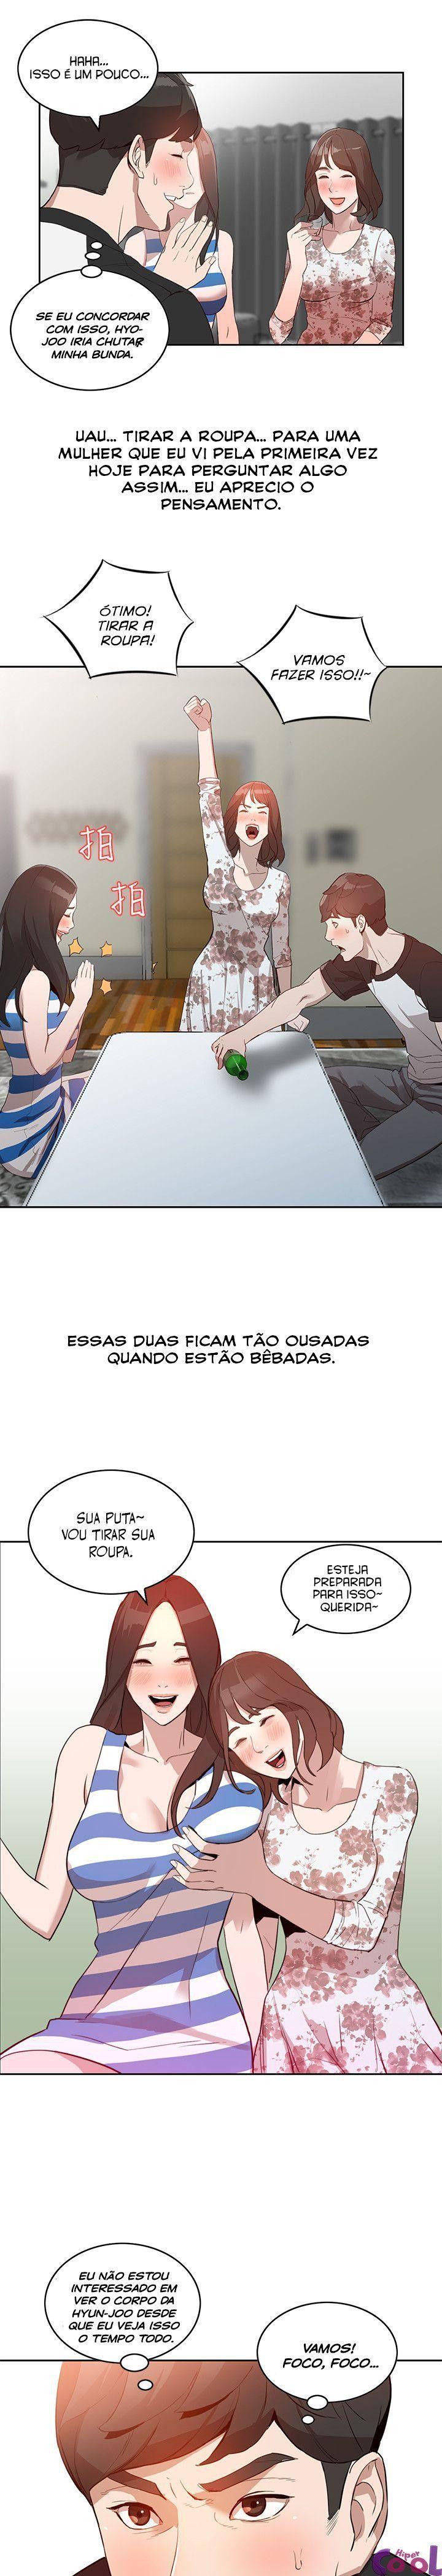 Mulher Casada - Foto 23